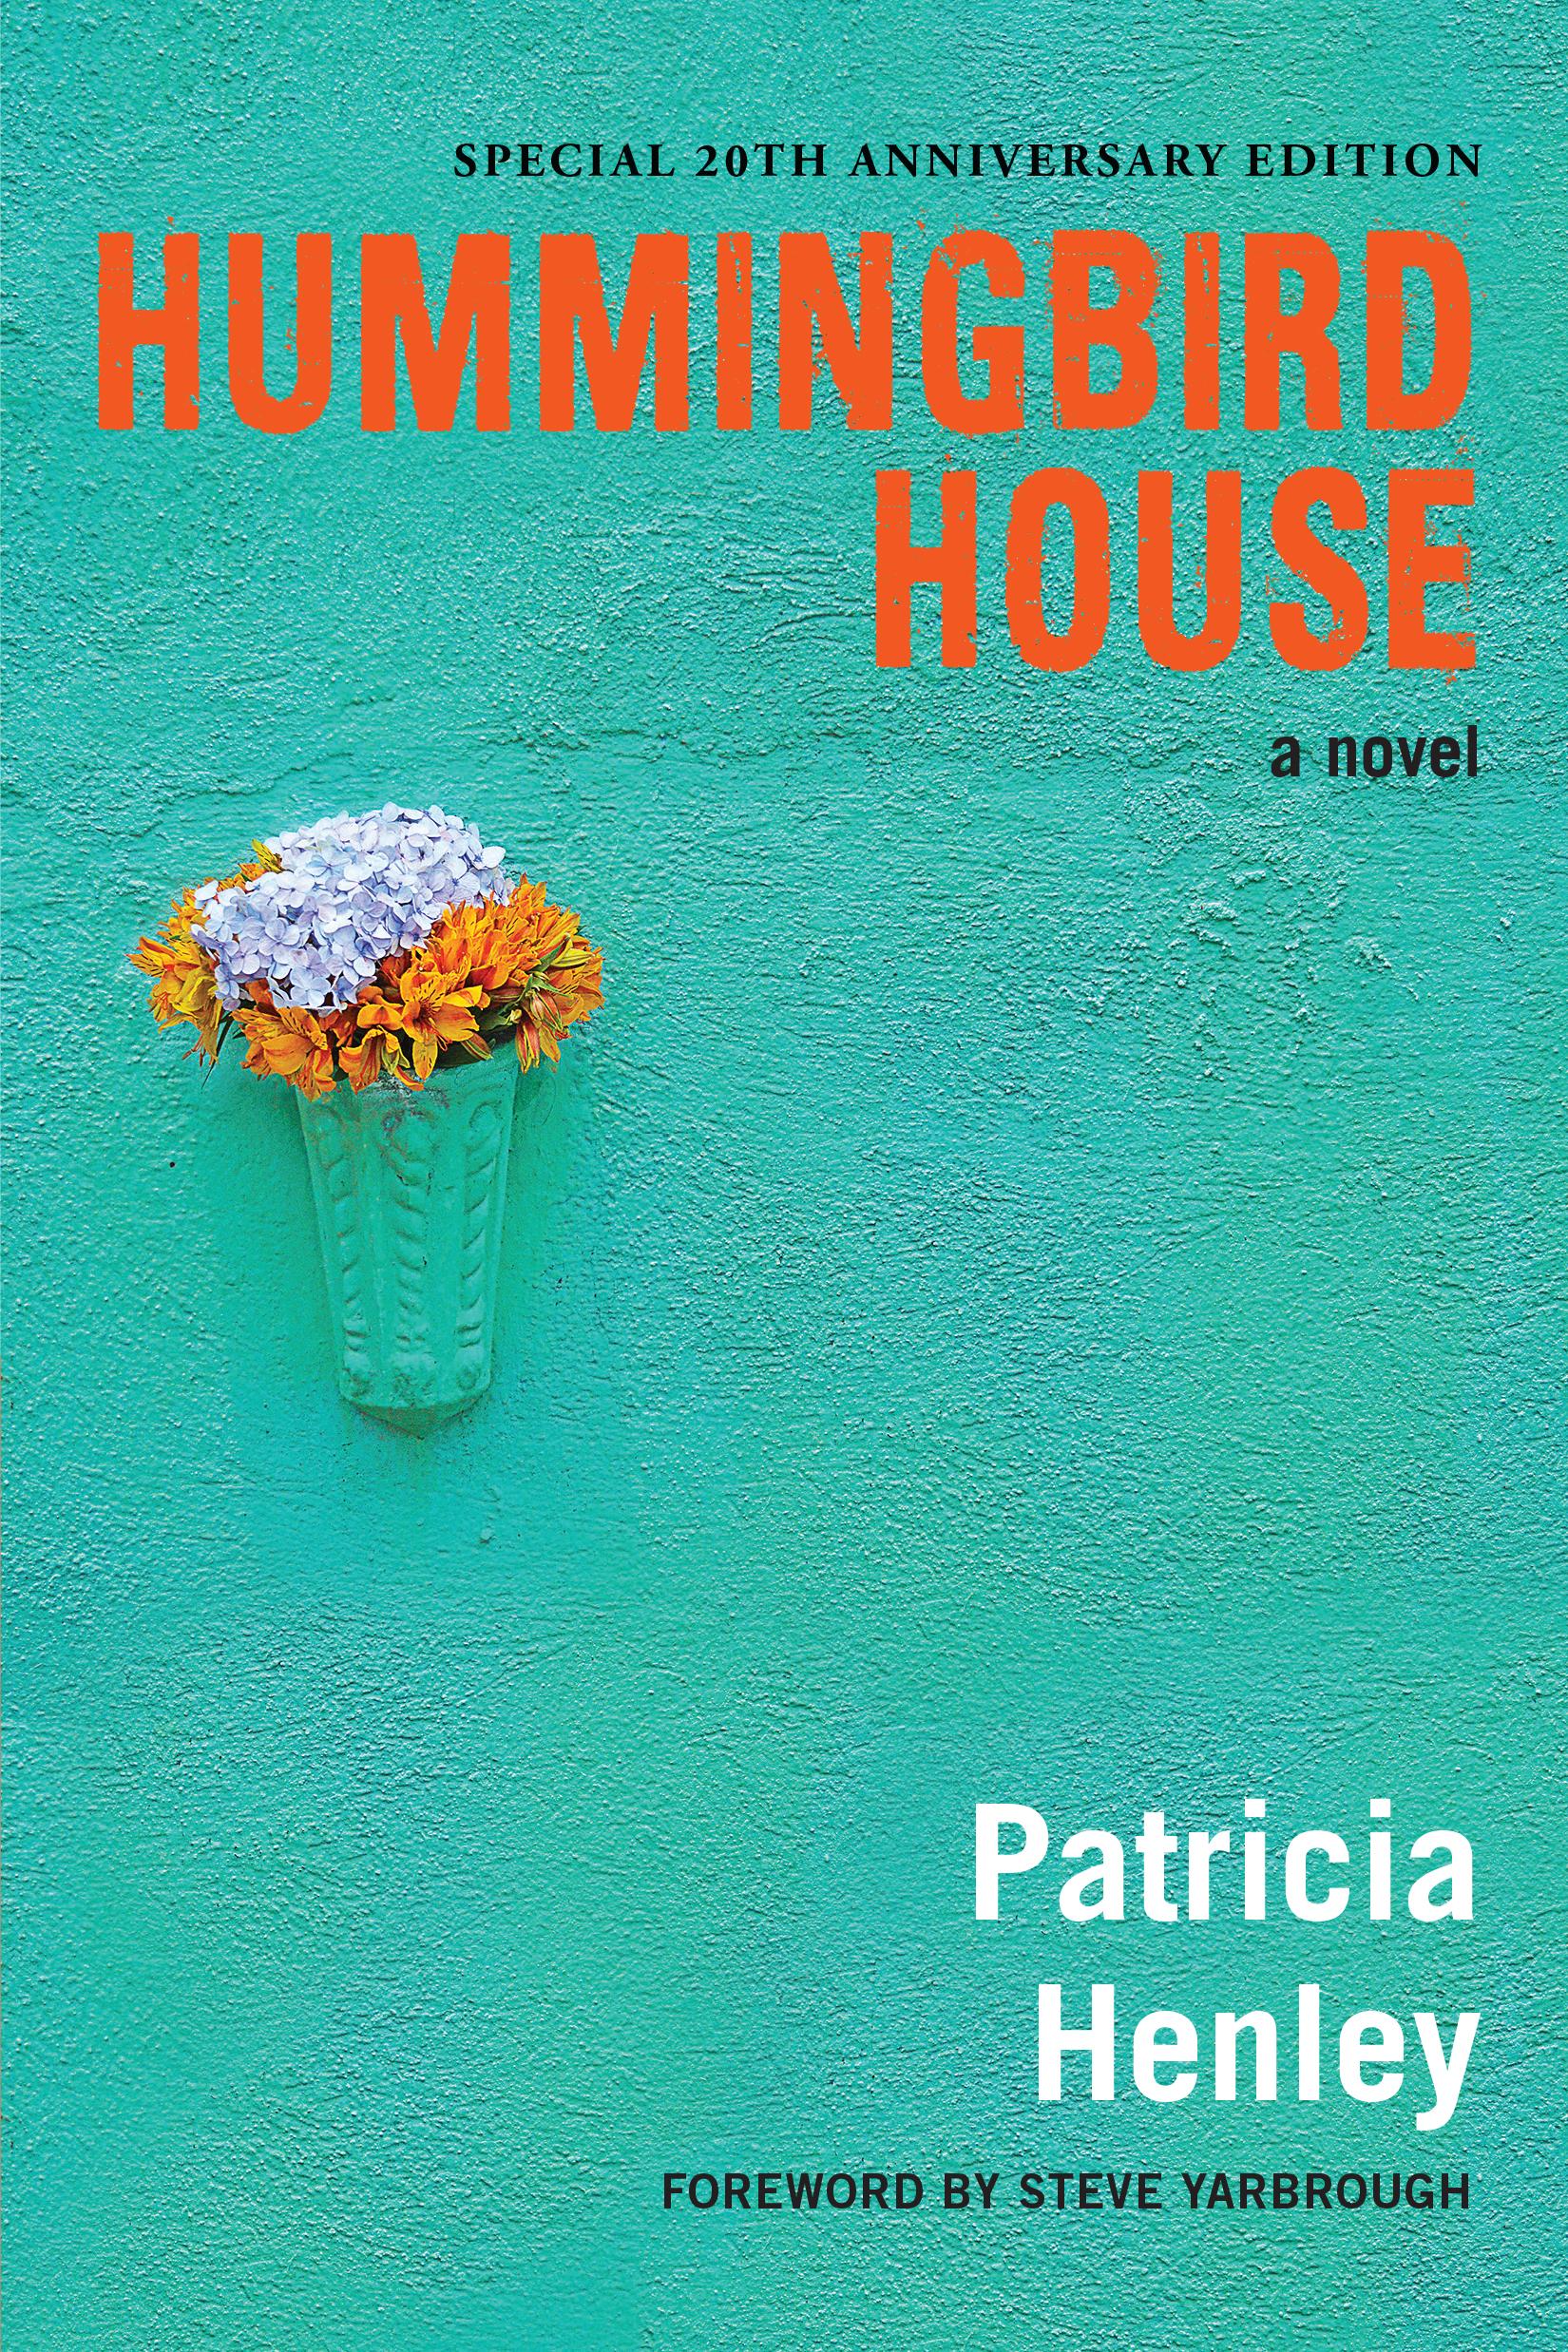 Hummingbird-House-Book-Digital 4.4.19 (1)-1.jpg